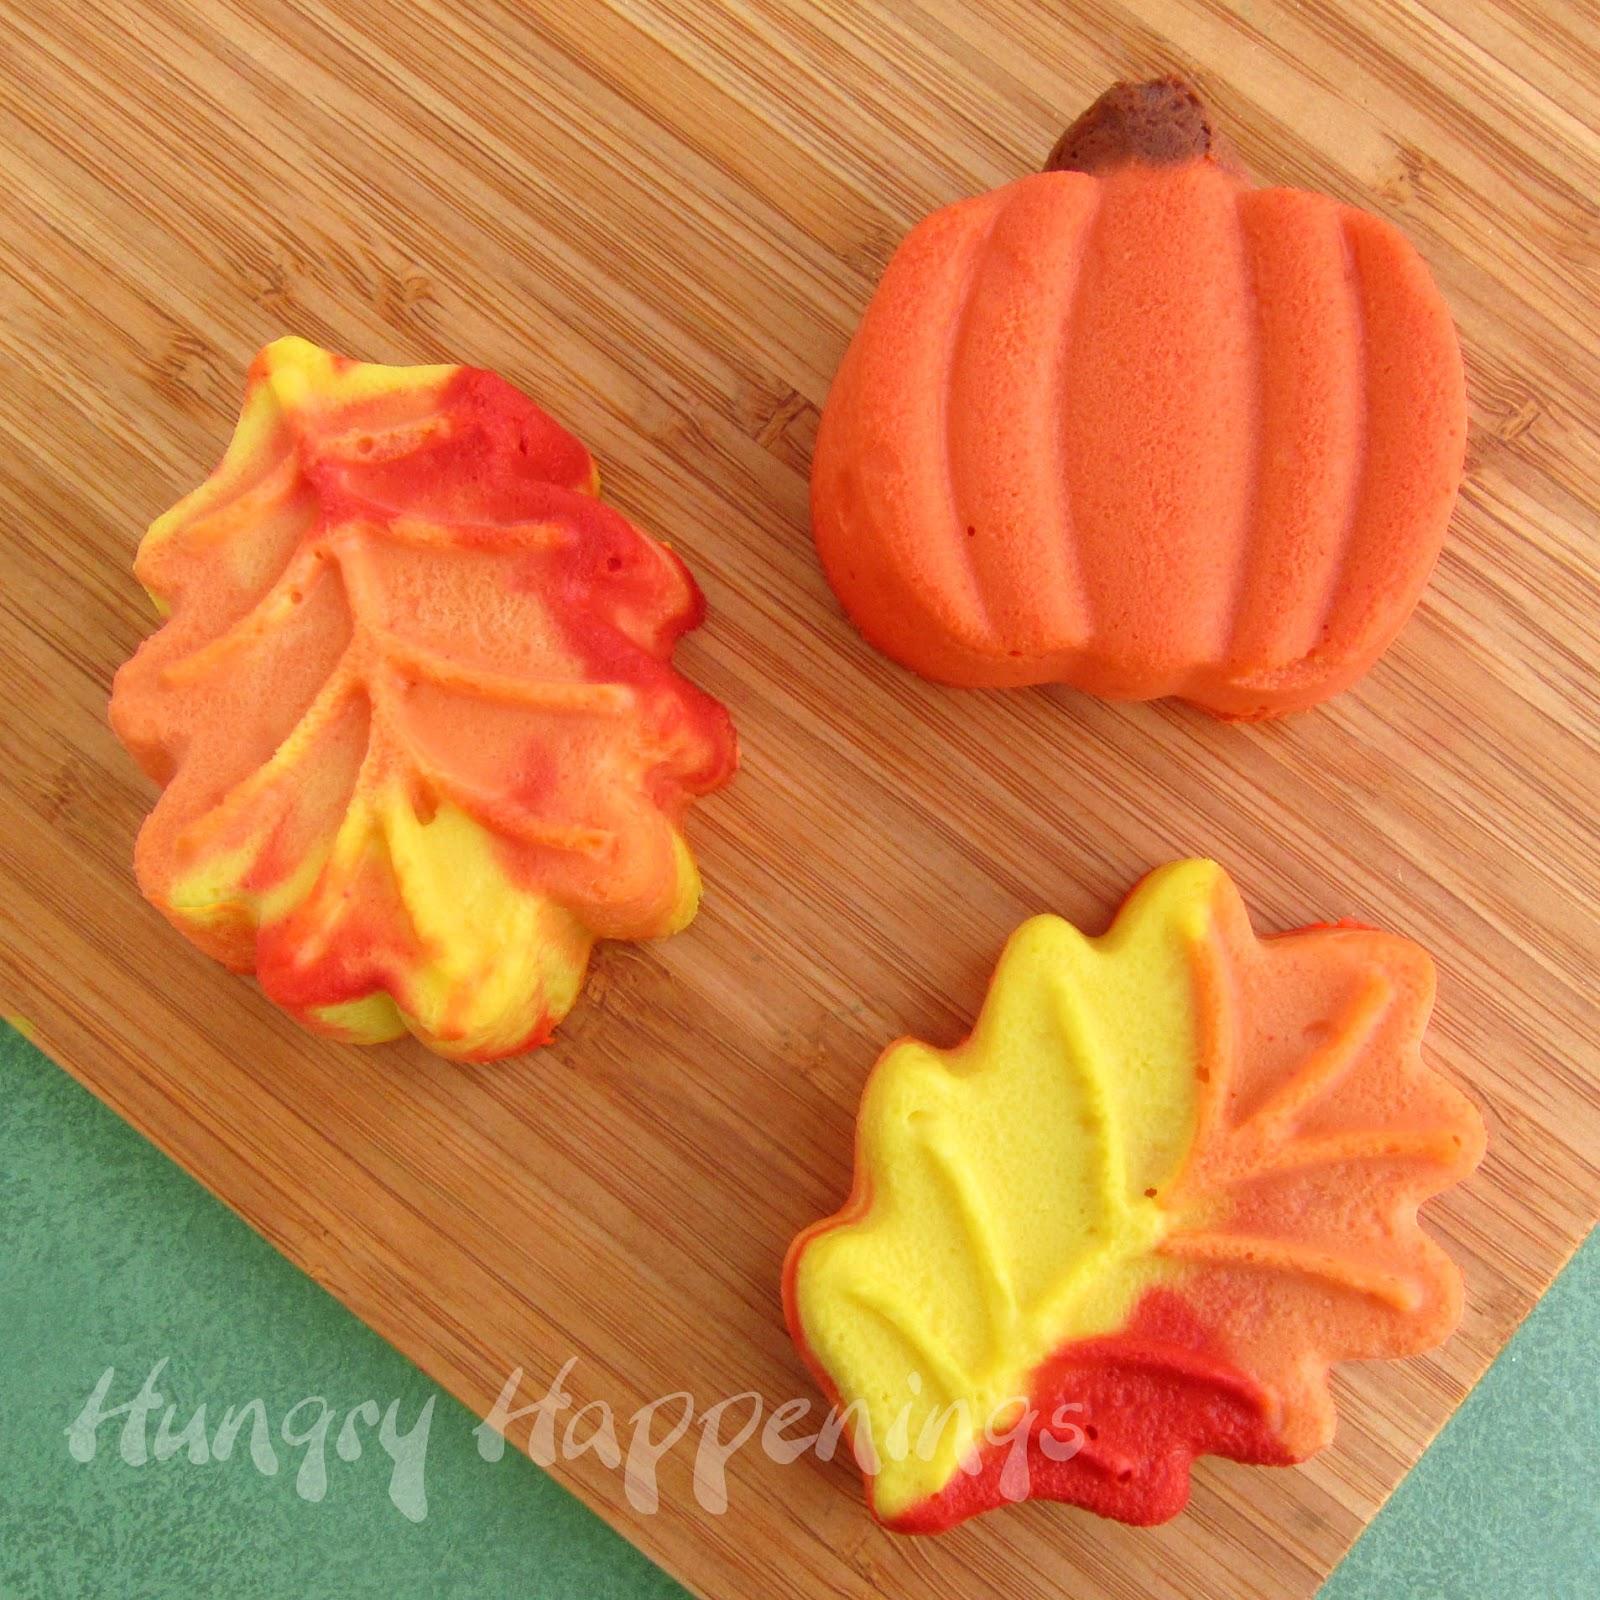 Cheesecake Ghosts make fun desserts for Halloween